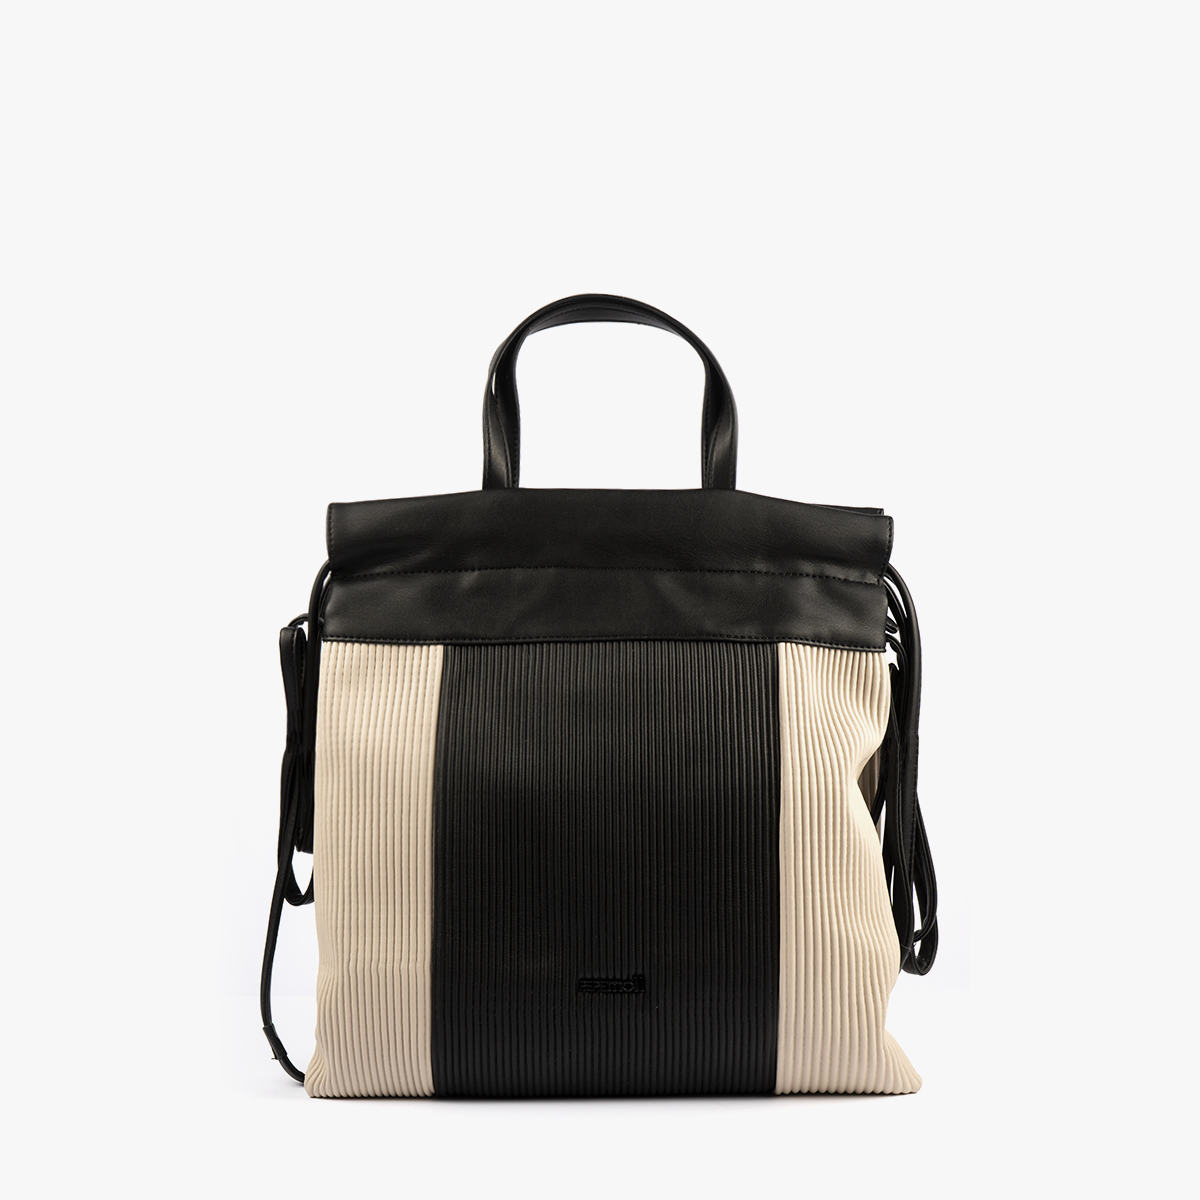 44120 bolso de mochila dorado/negro pepemoll frontal (1)